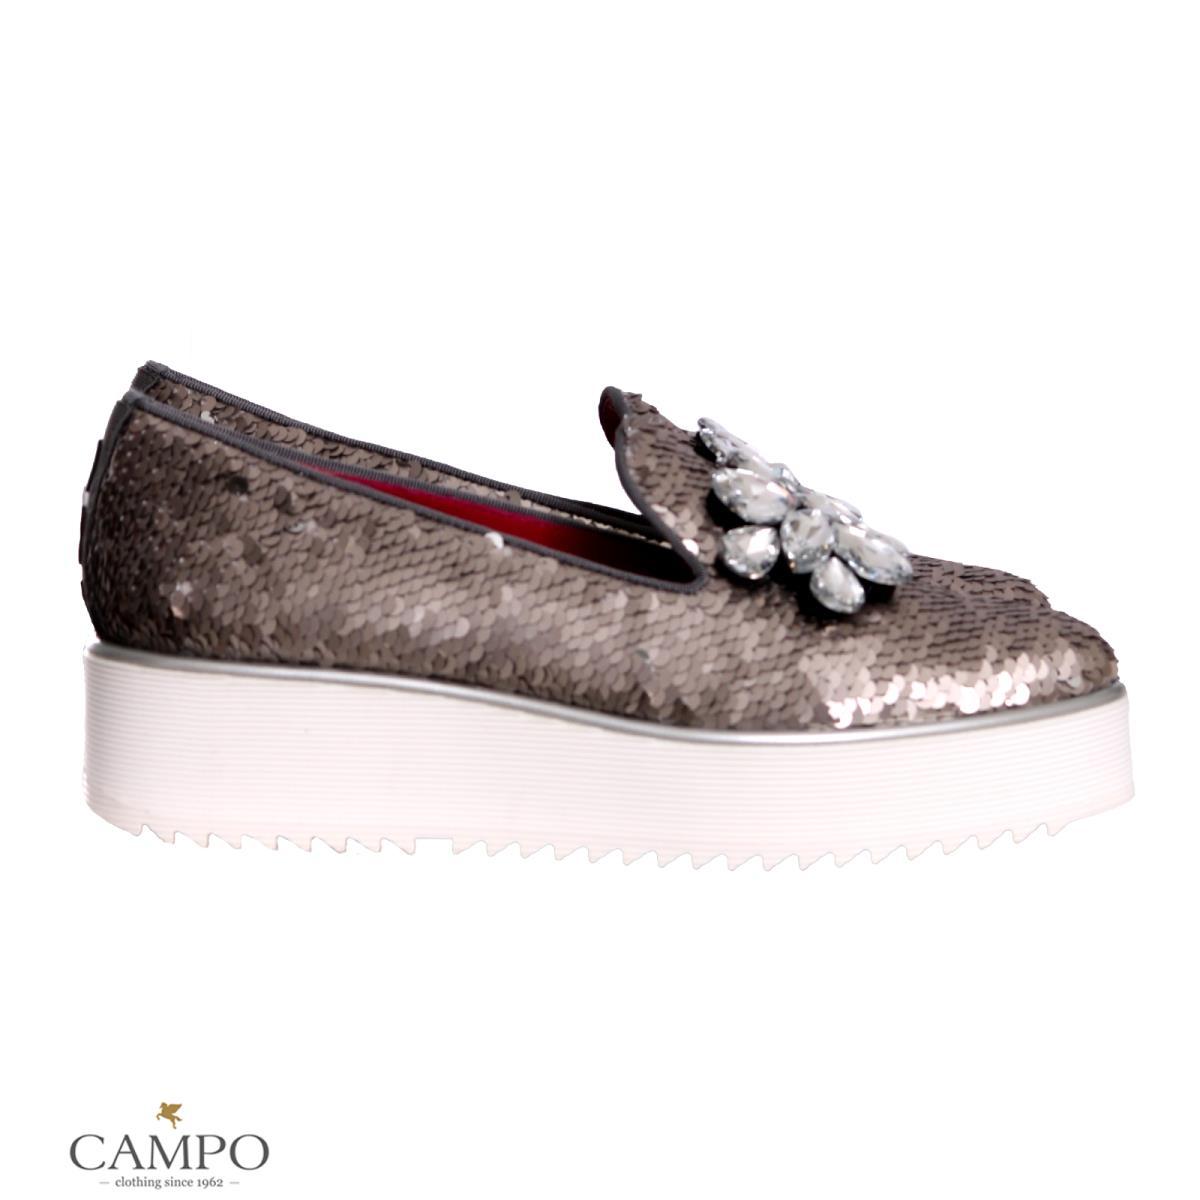 premium selection 13ea4 7669e 181 Scarpe iside | Campo Moda